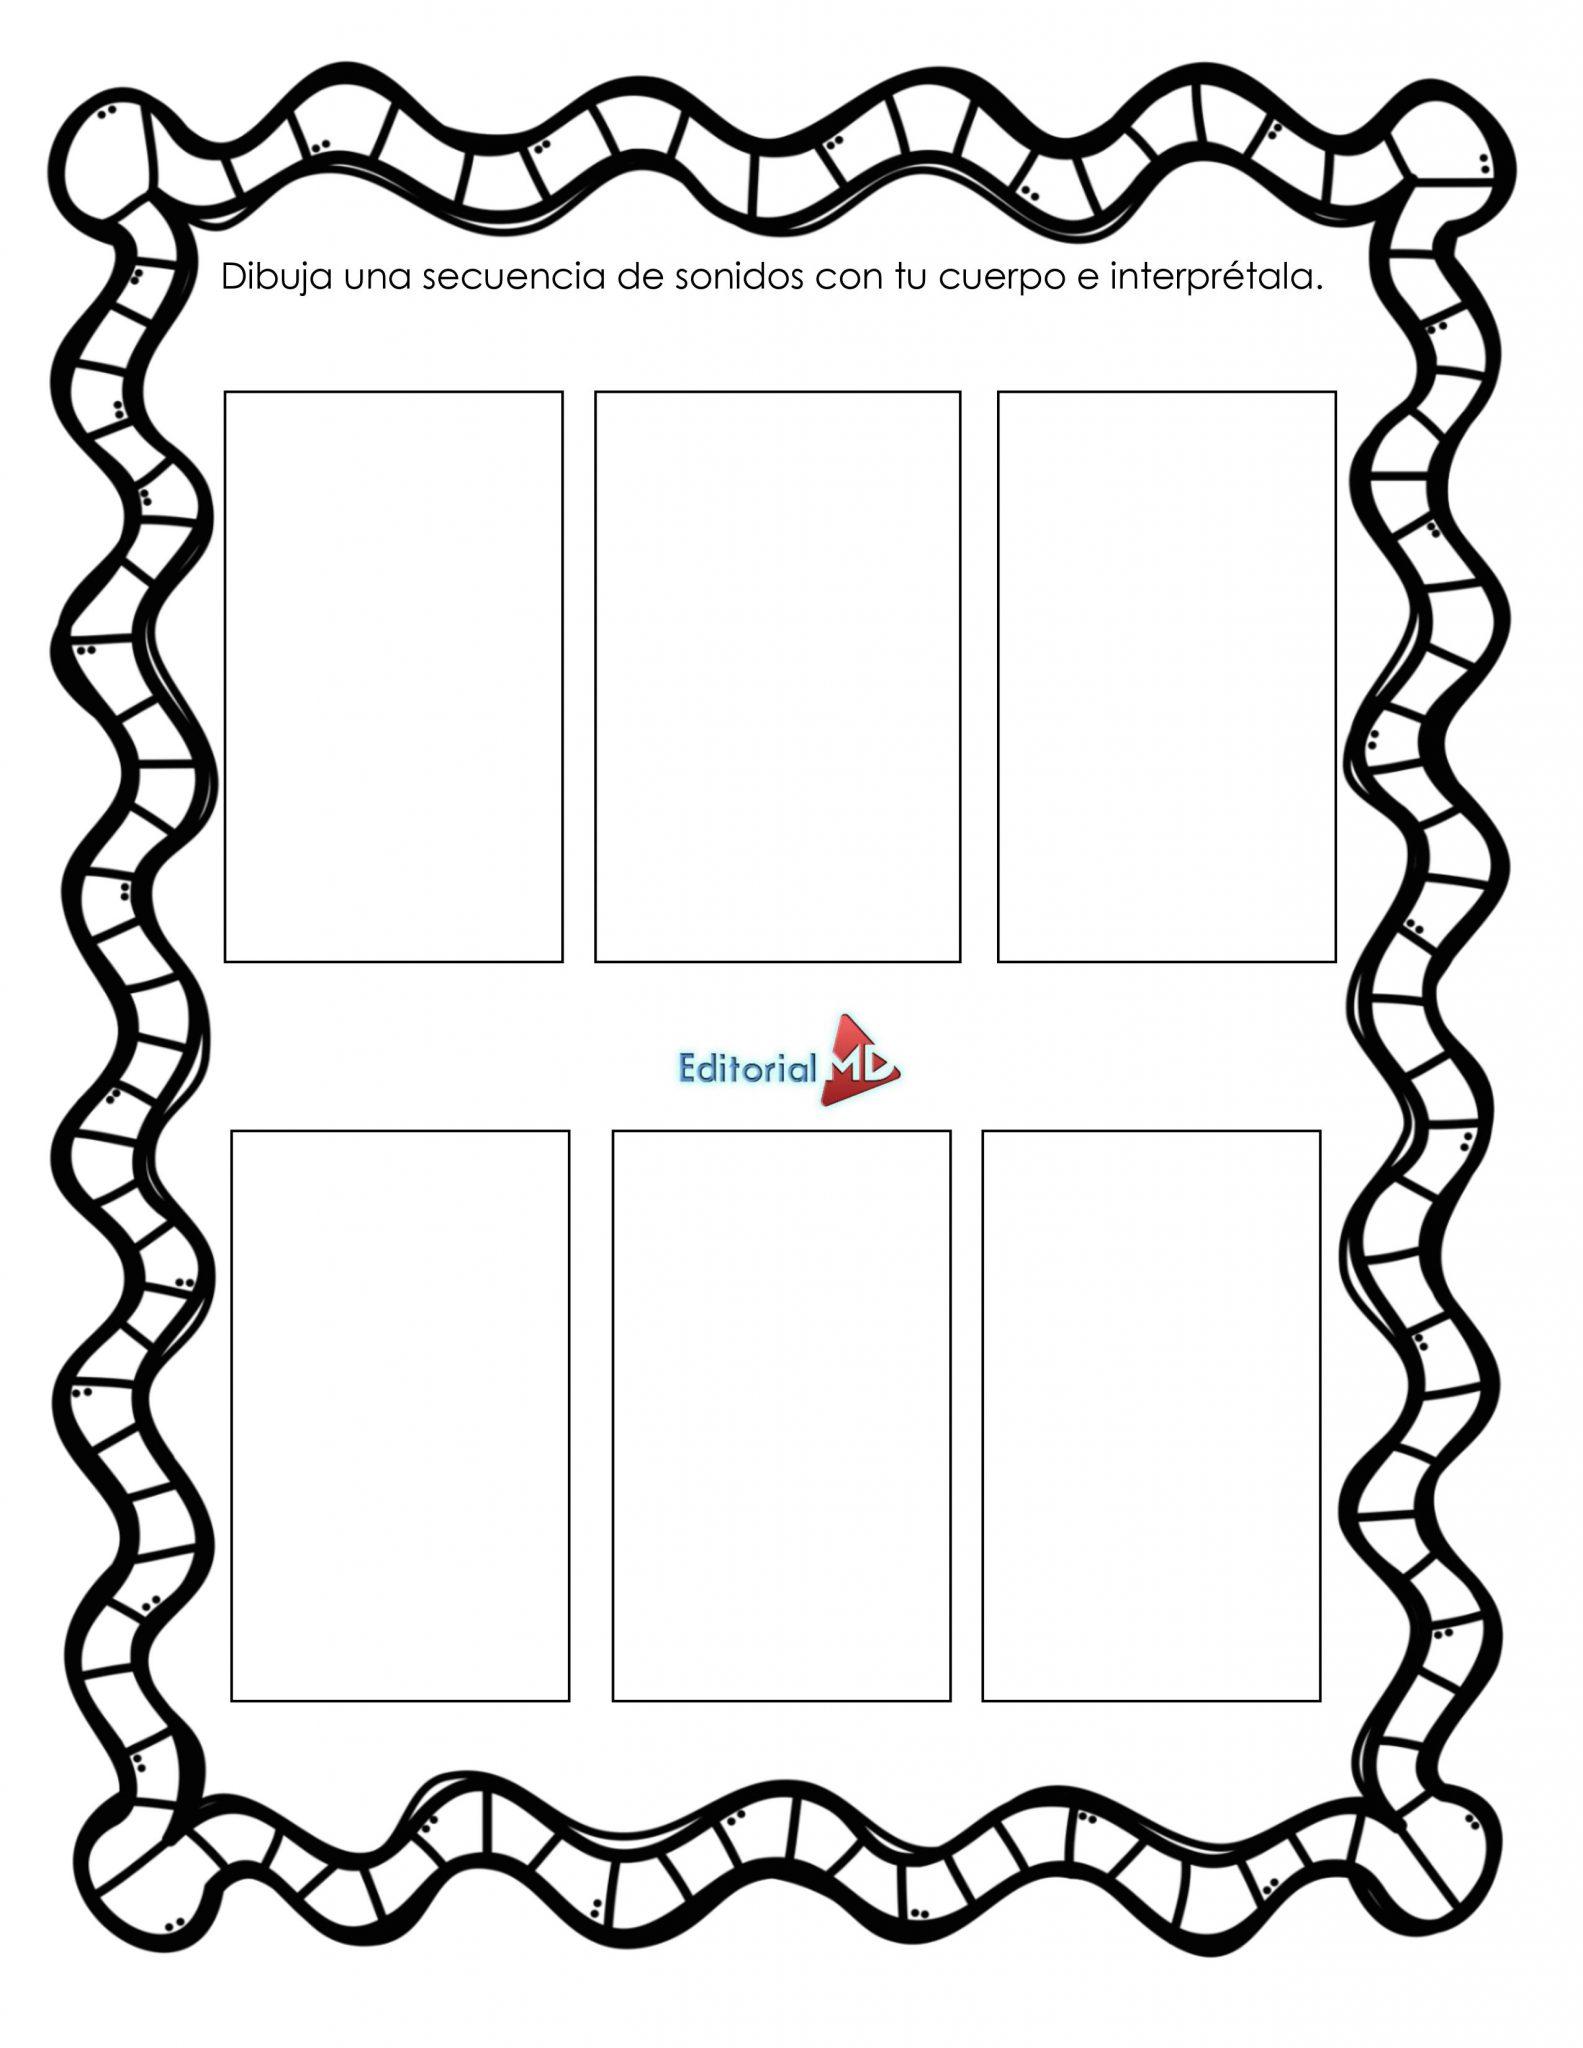 Ejemplo Material de apoyo semana 39 preescolar 02